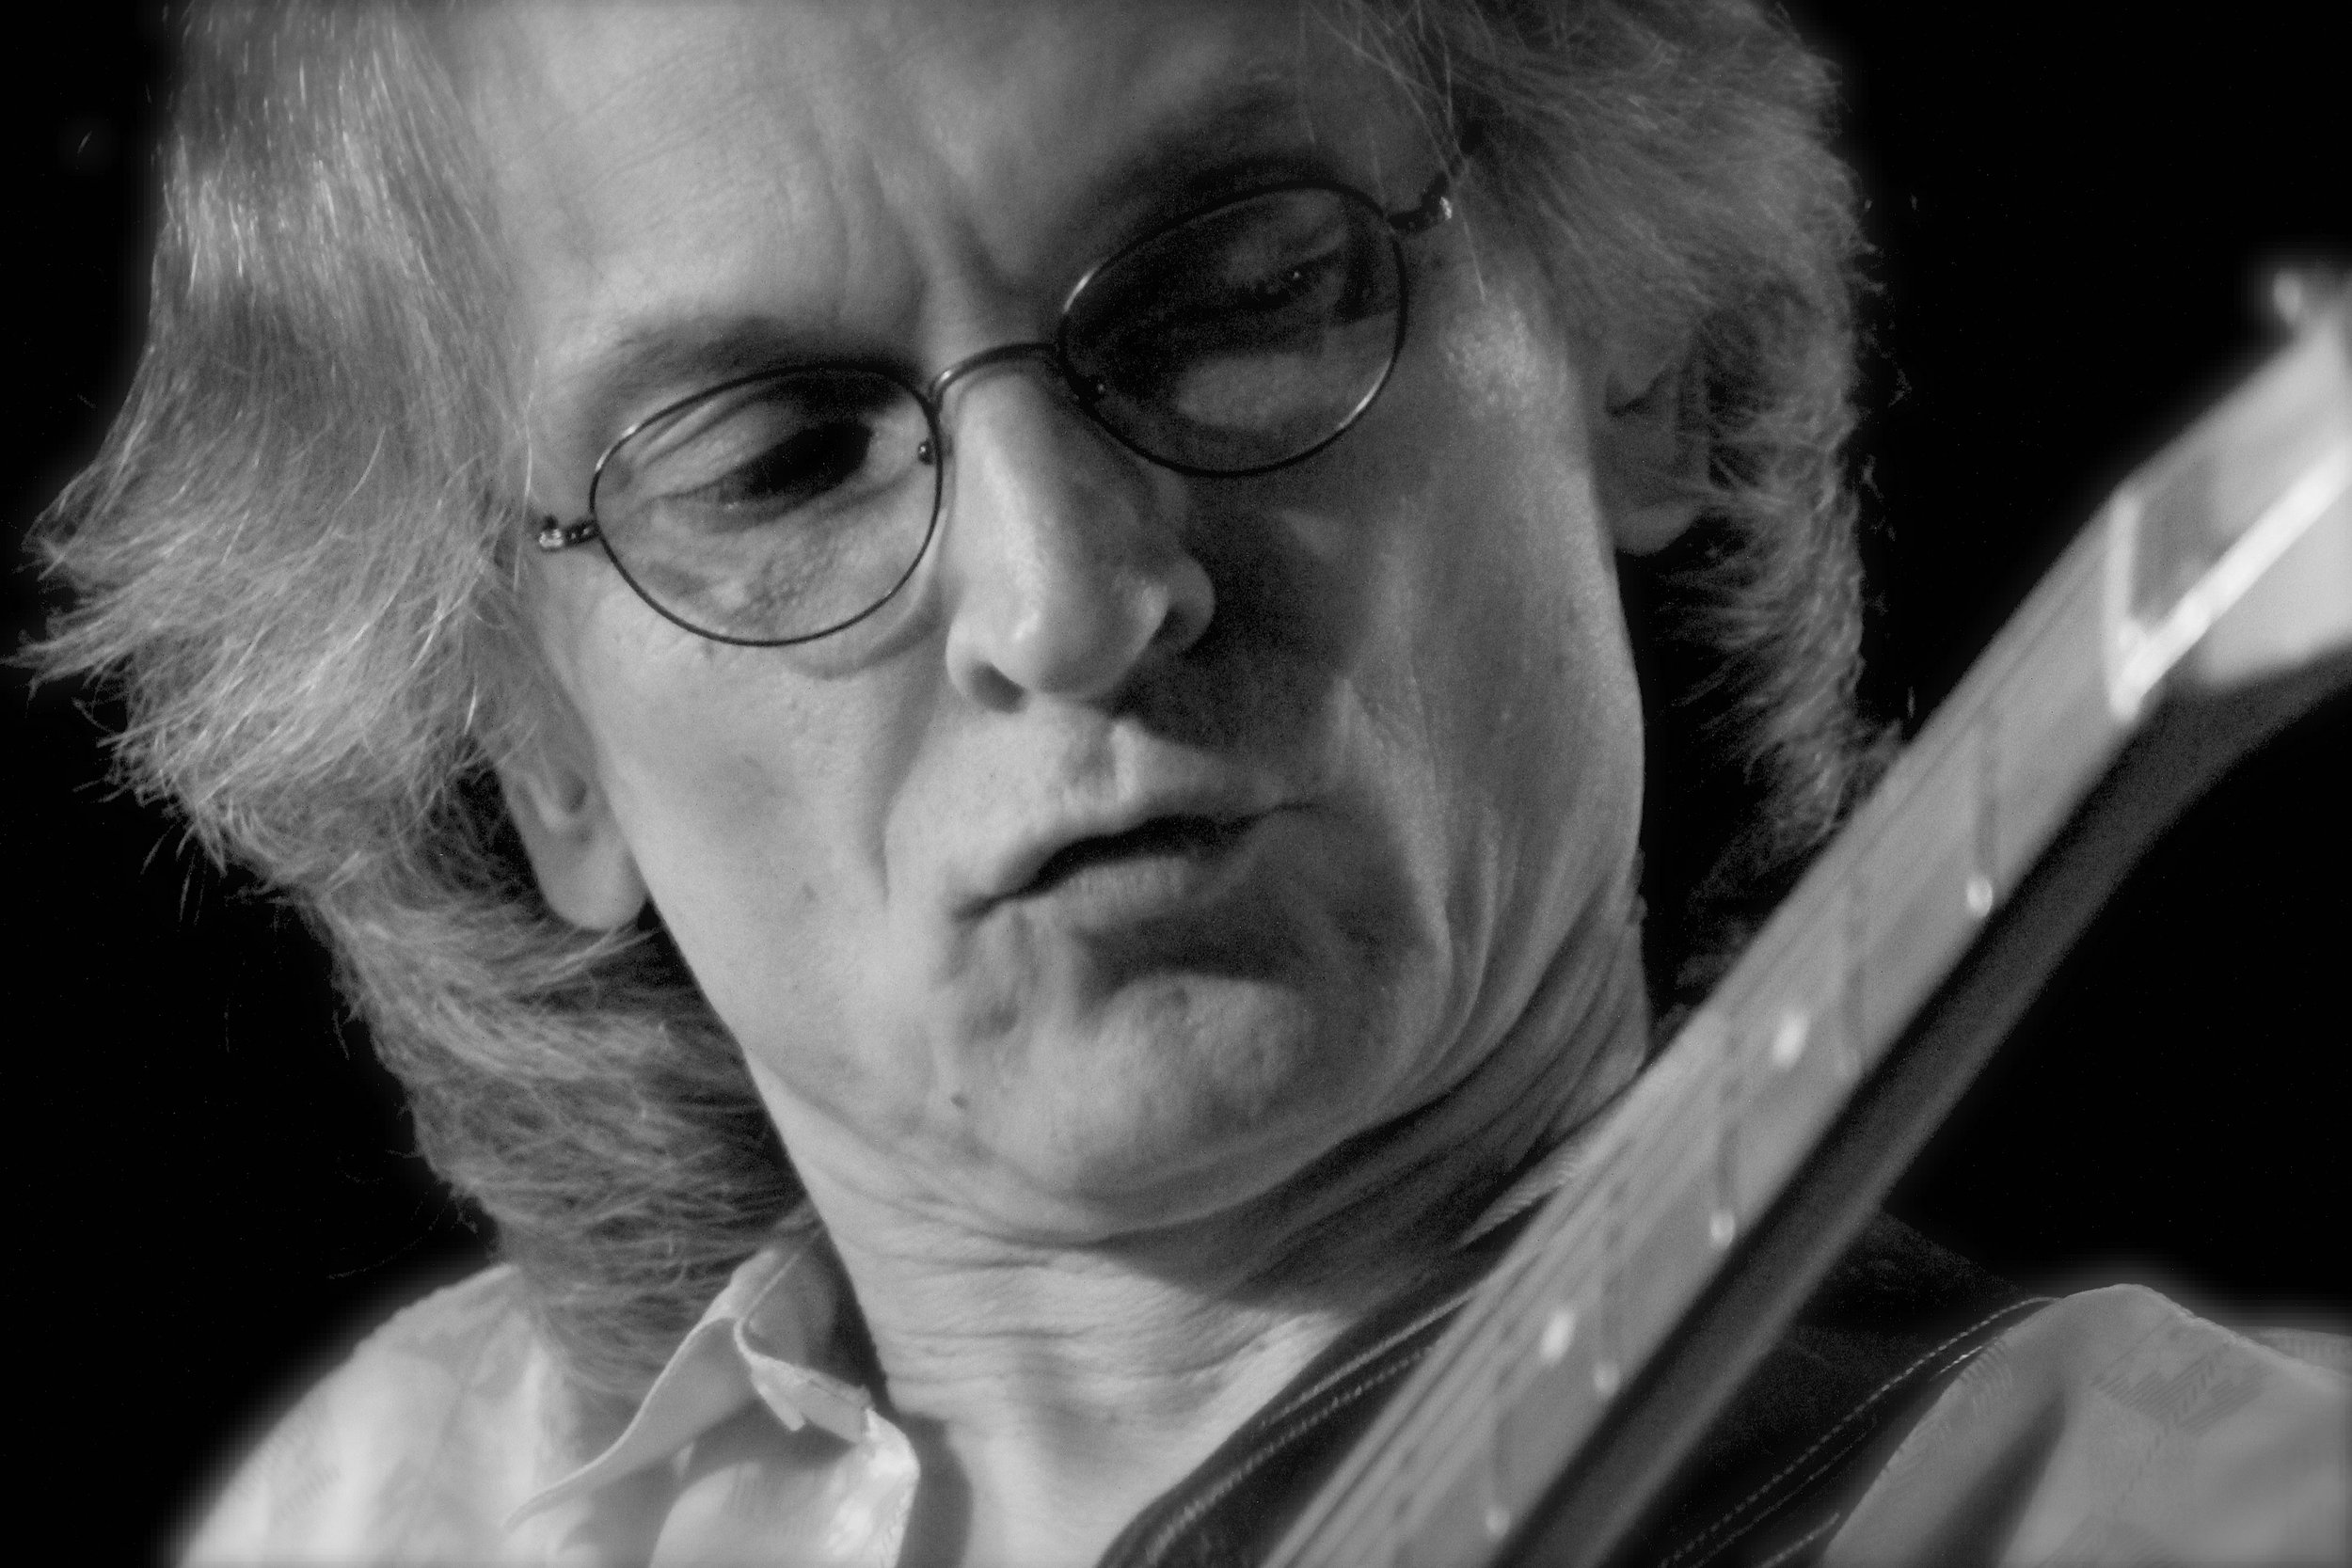 Sonny Landreth, RME, Davenport IA, 2012